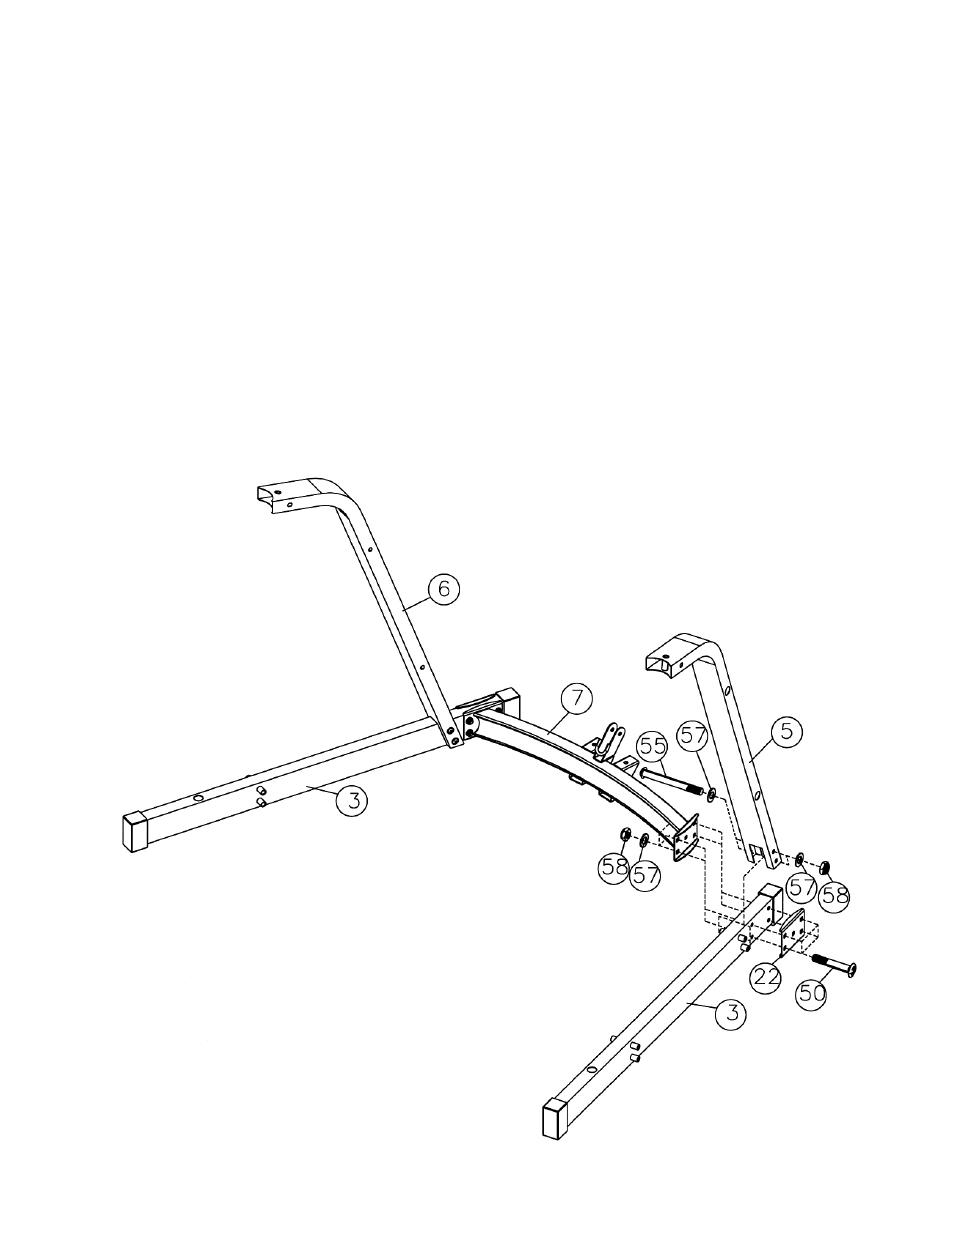 Smith Machine Assembly Instruction  Diagram 1